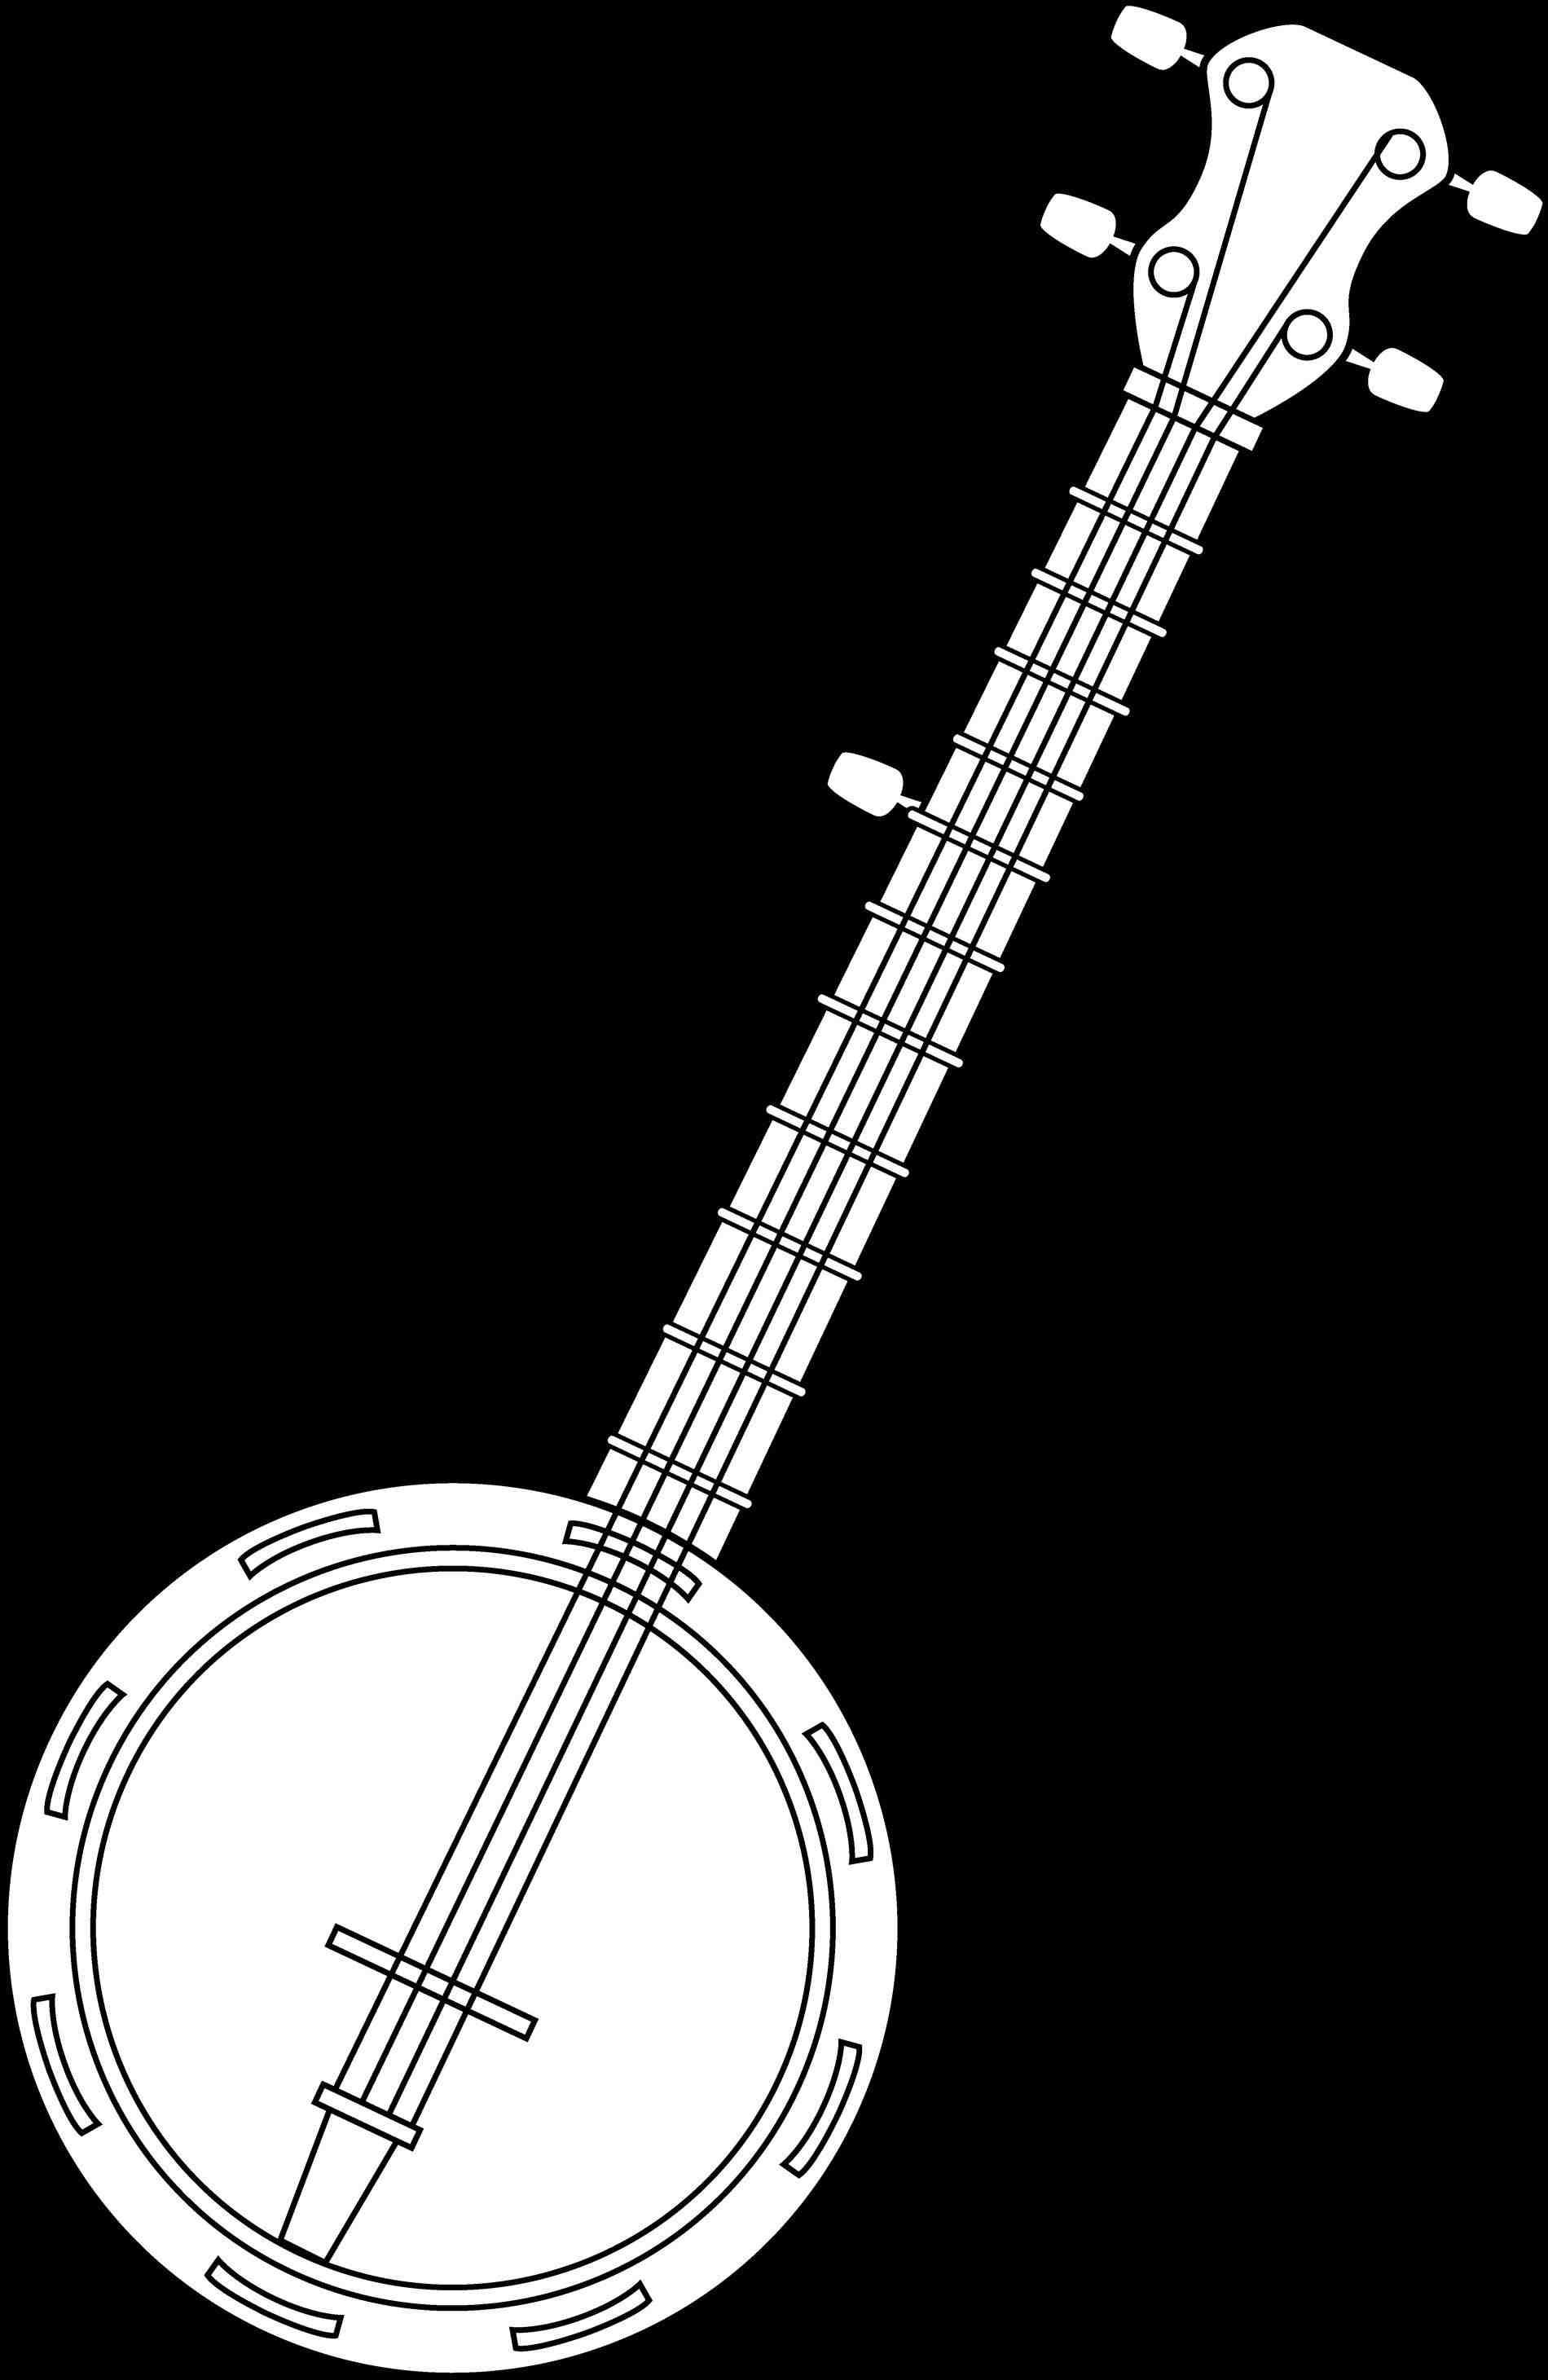 Banjo clipart bluegrass. Cliparts sweet many interesting